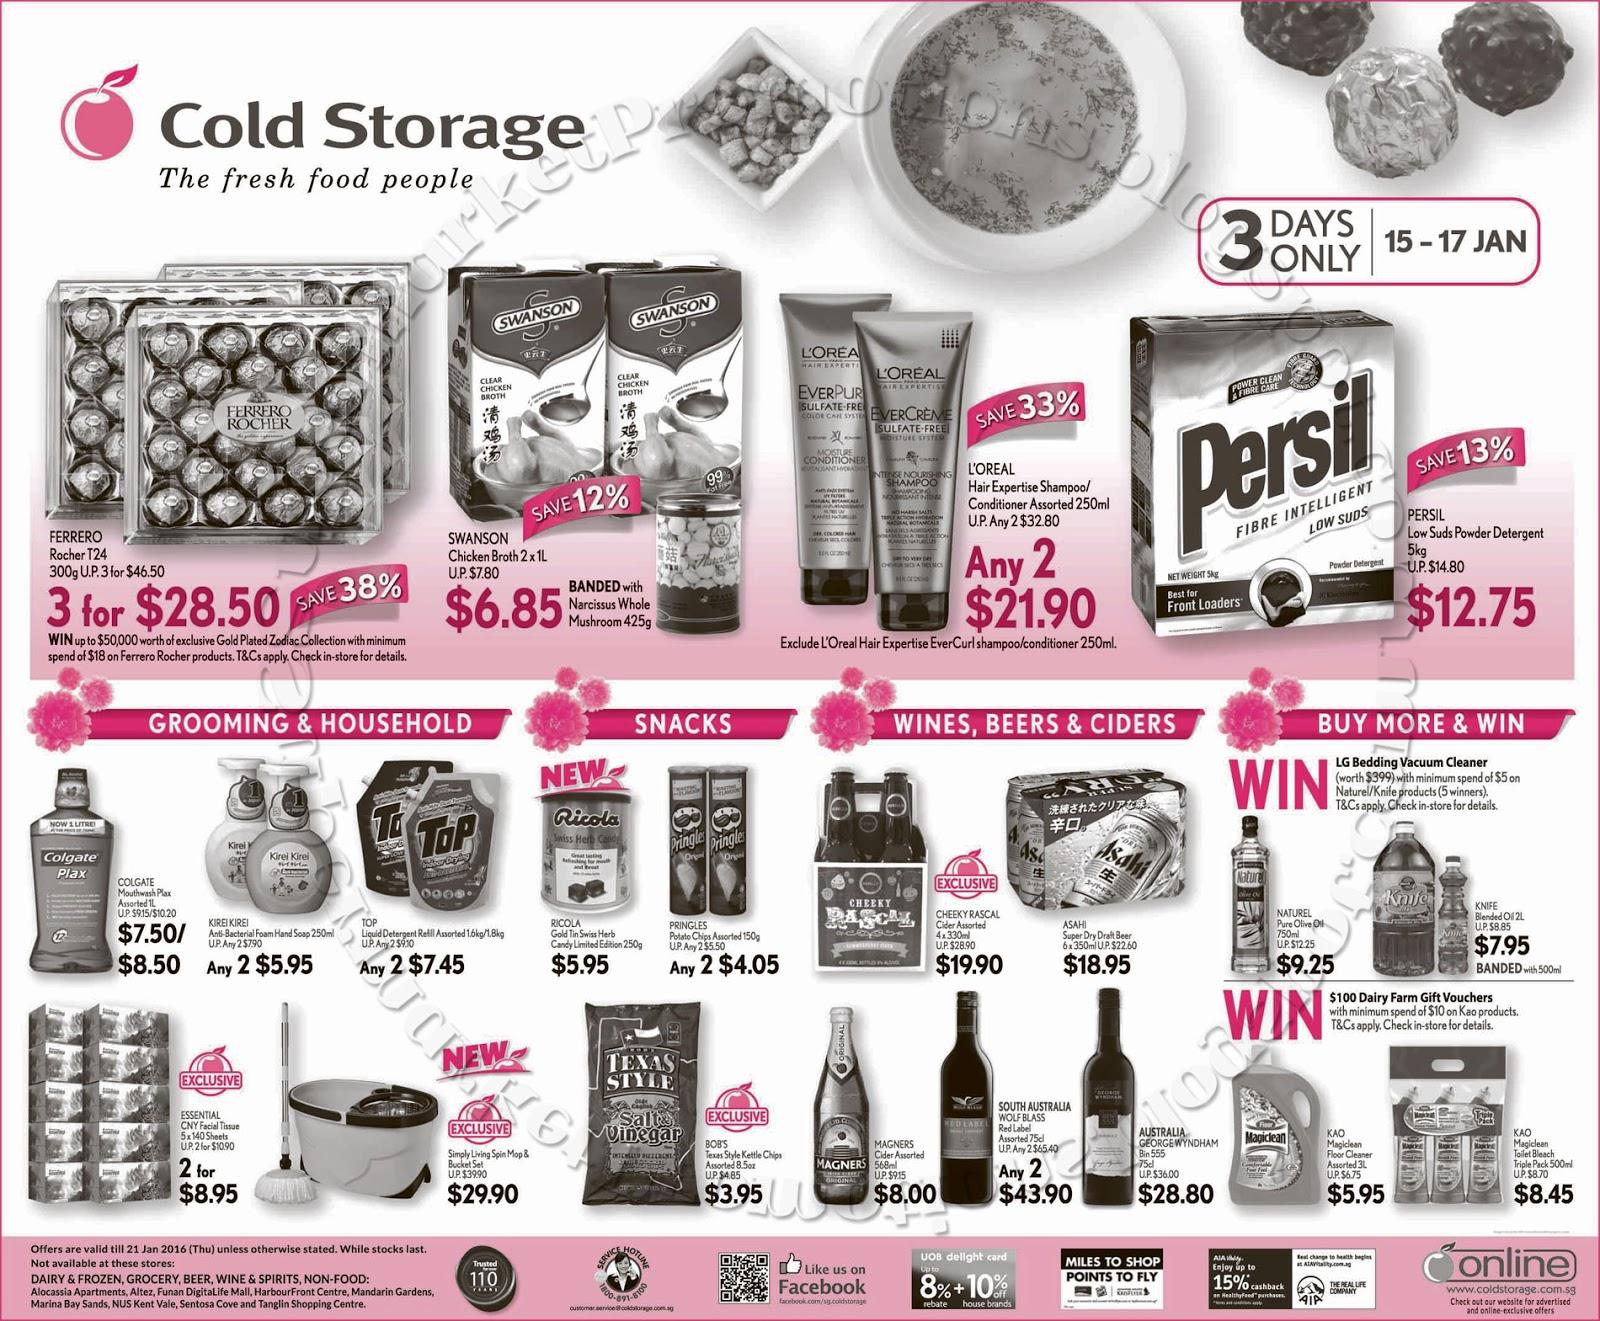 Cold Storage Promotion 15 21 January 2016 Supermarket  sc 1 st  Listitdallas & Dairy Farm Cold Storage - Listitdallas